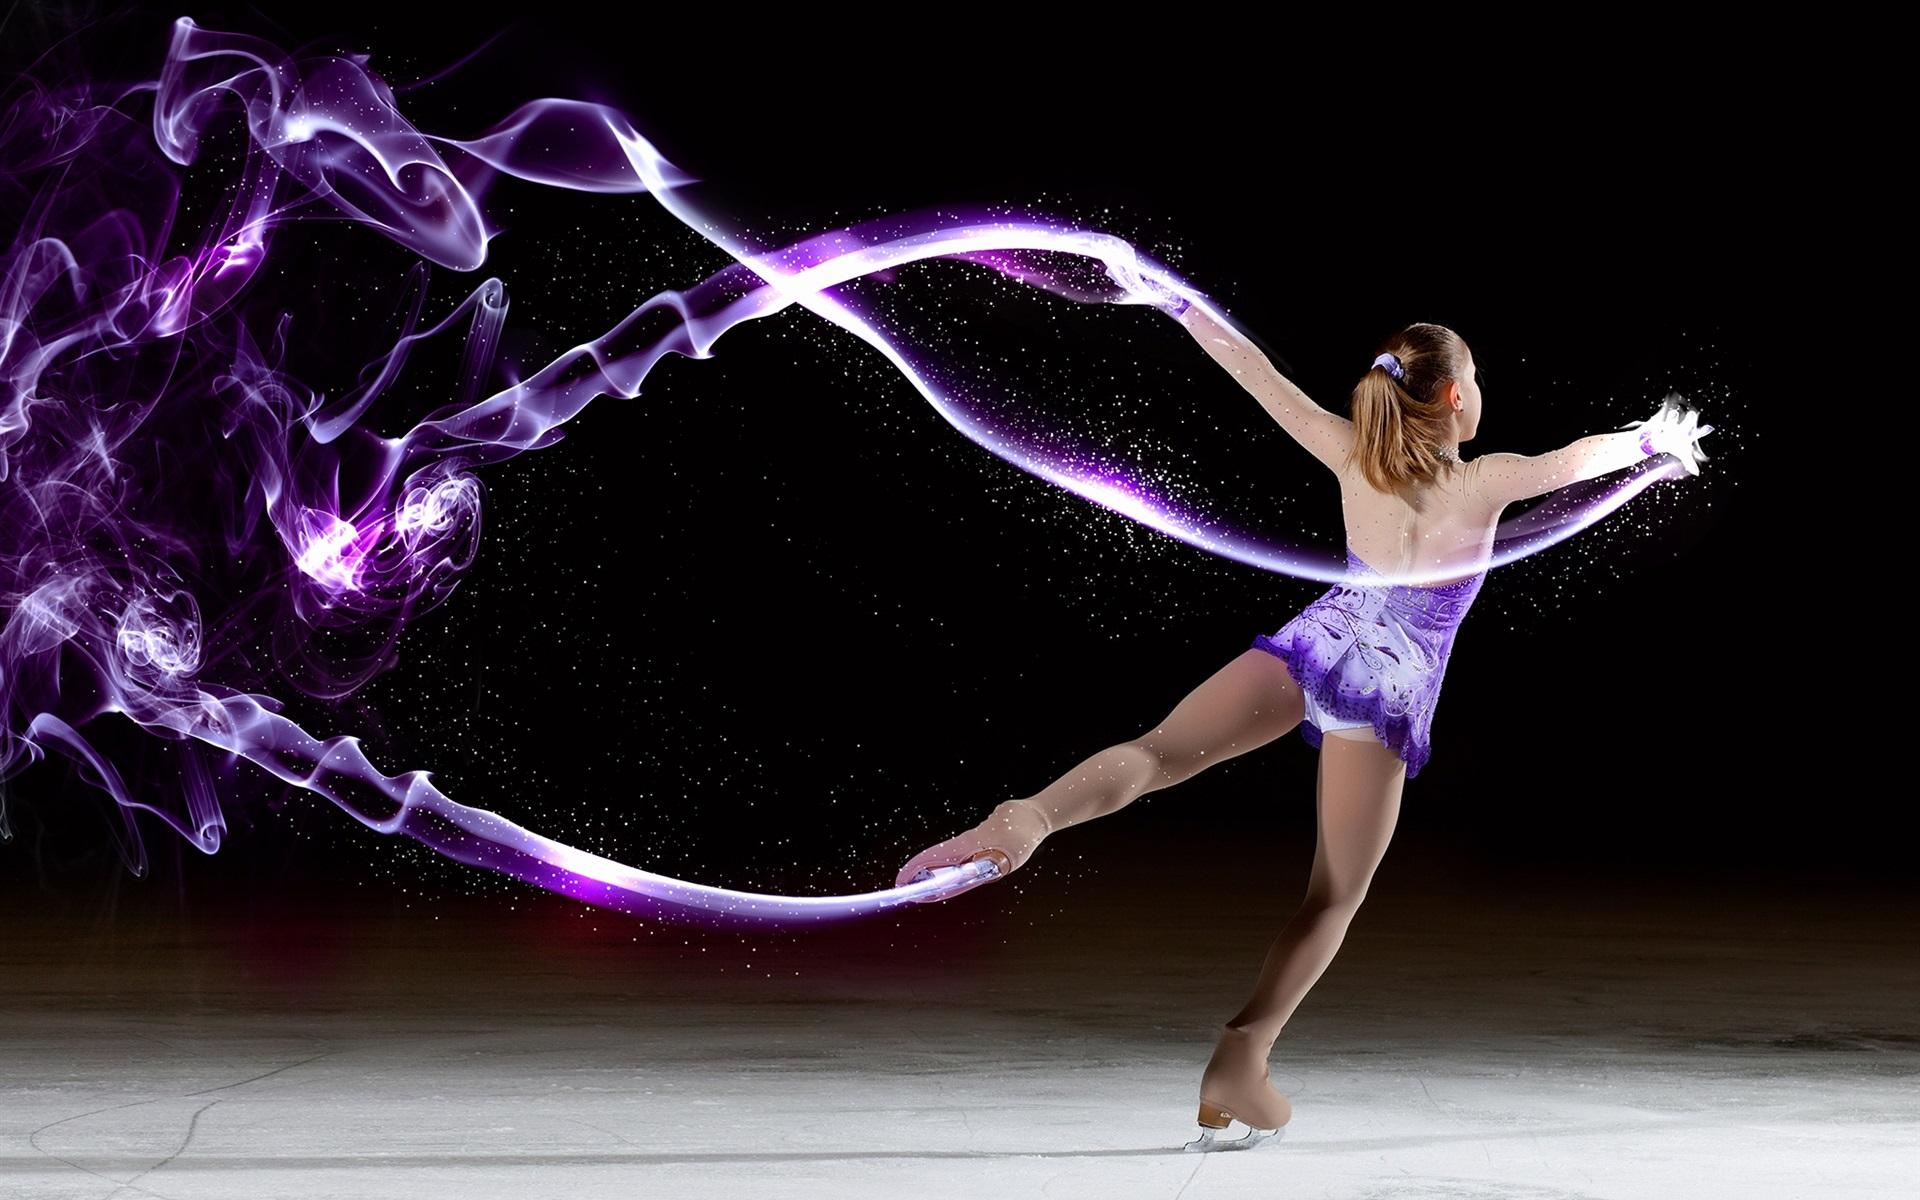 wallpaper abstraction dancing girl ice skates 1920x1200